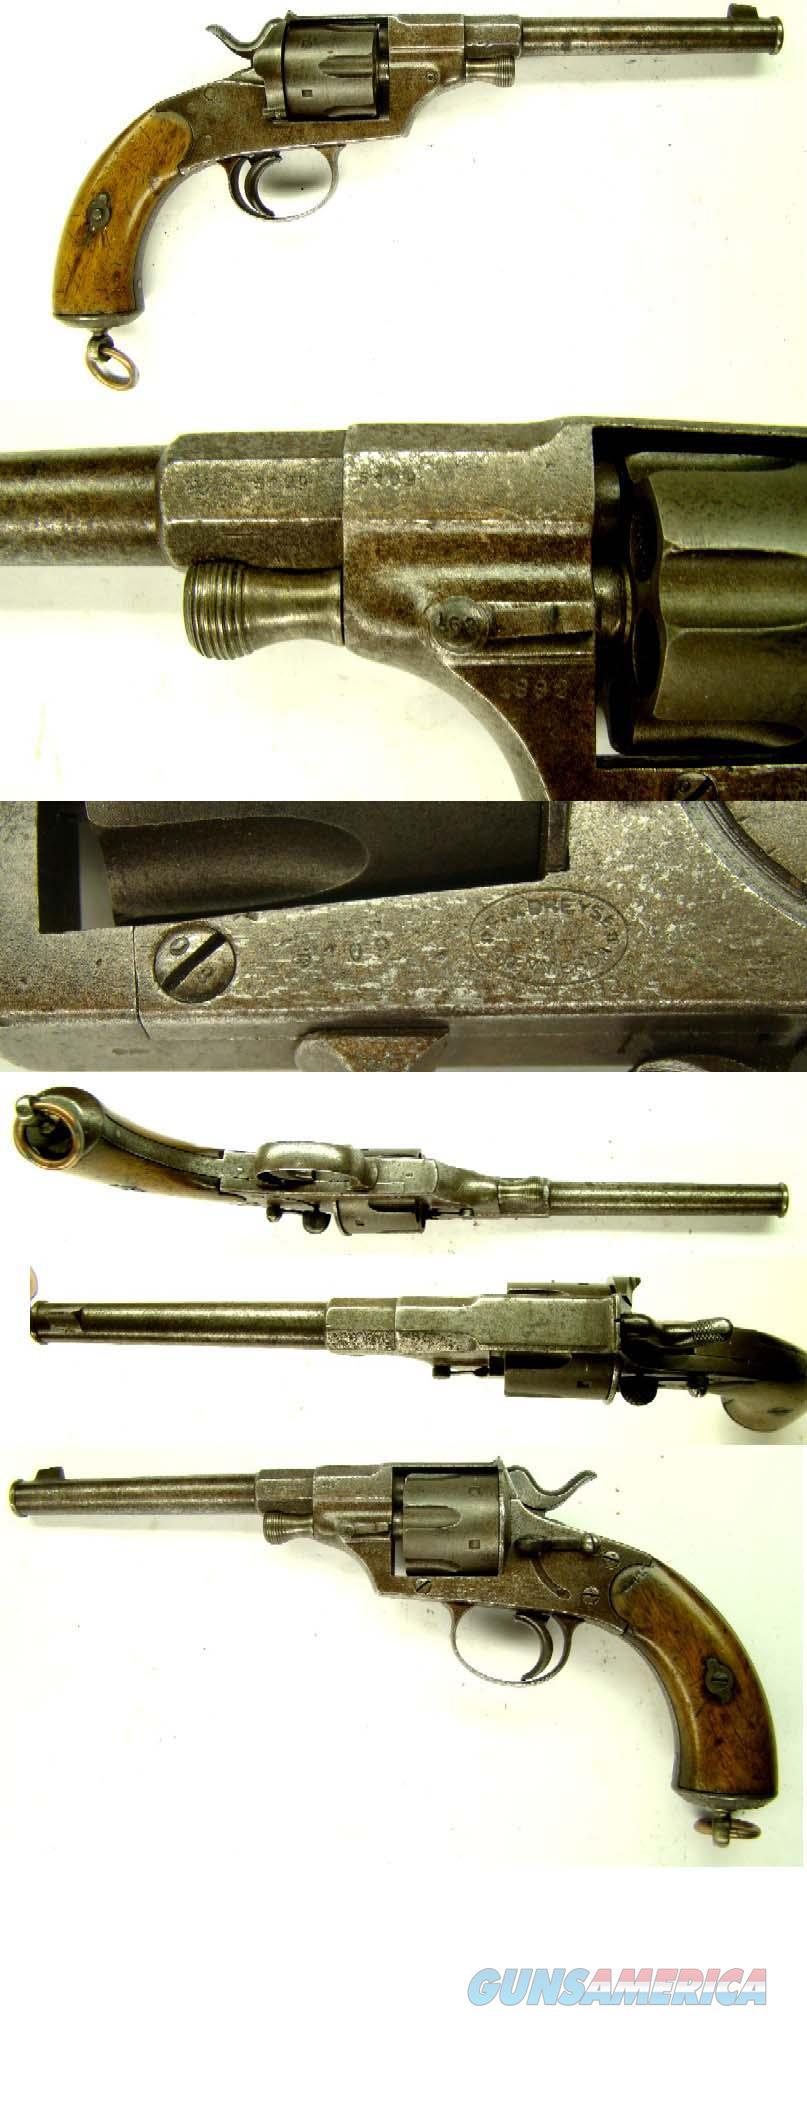 Reichsrevolver Cavalry Model 1879  Guns > Pistols > Military Misc. Pistols Non-US